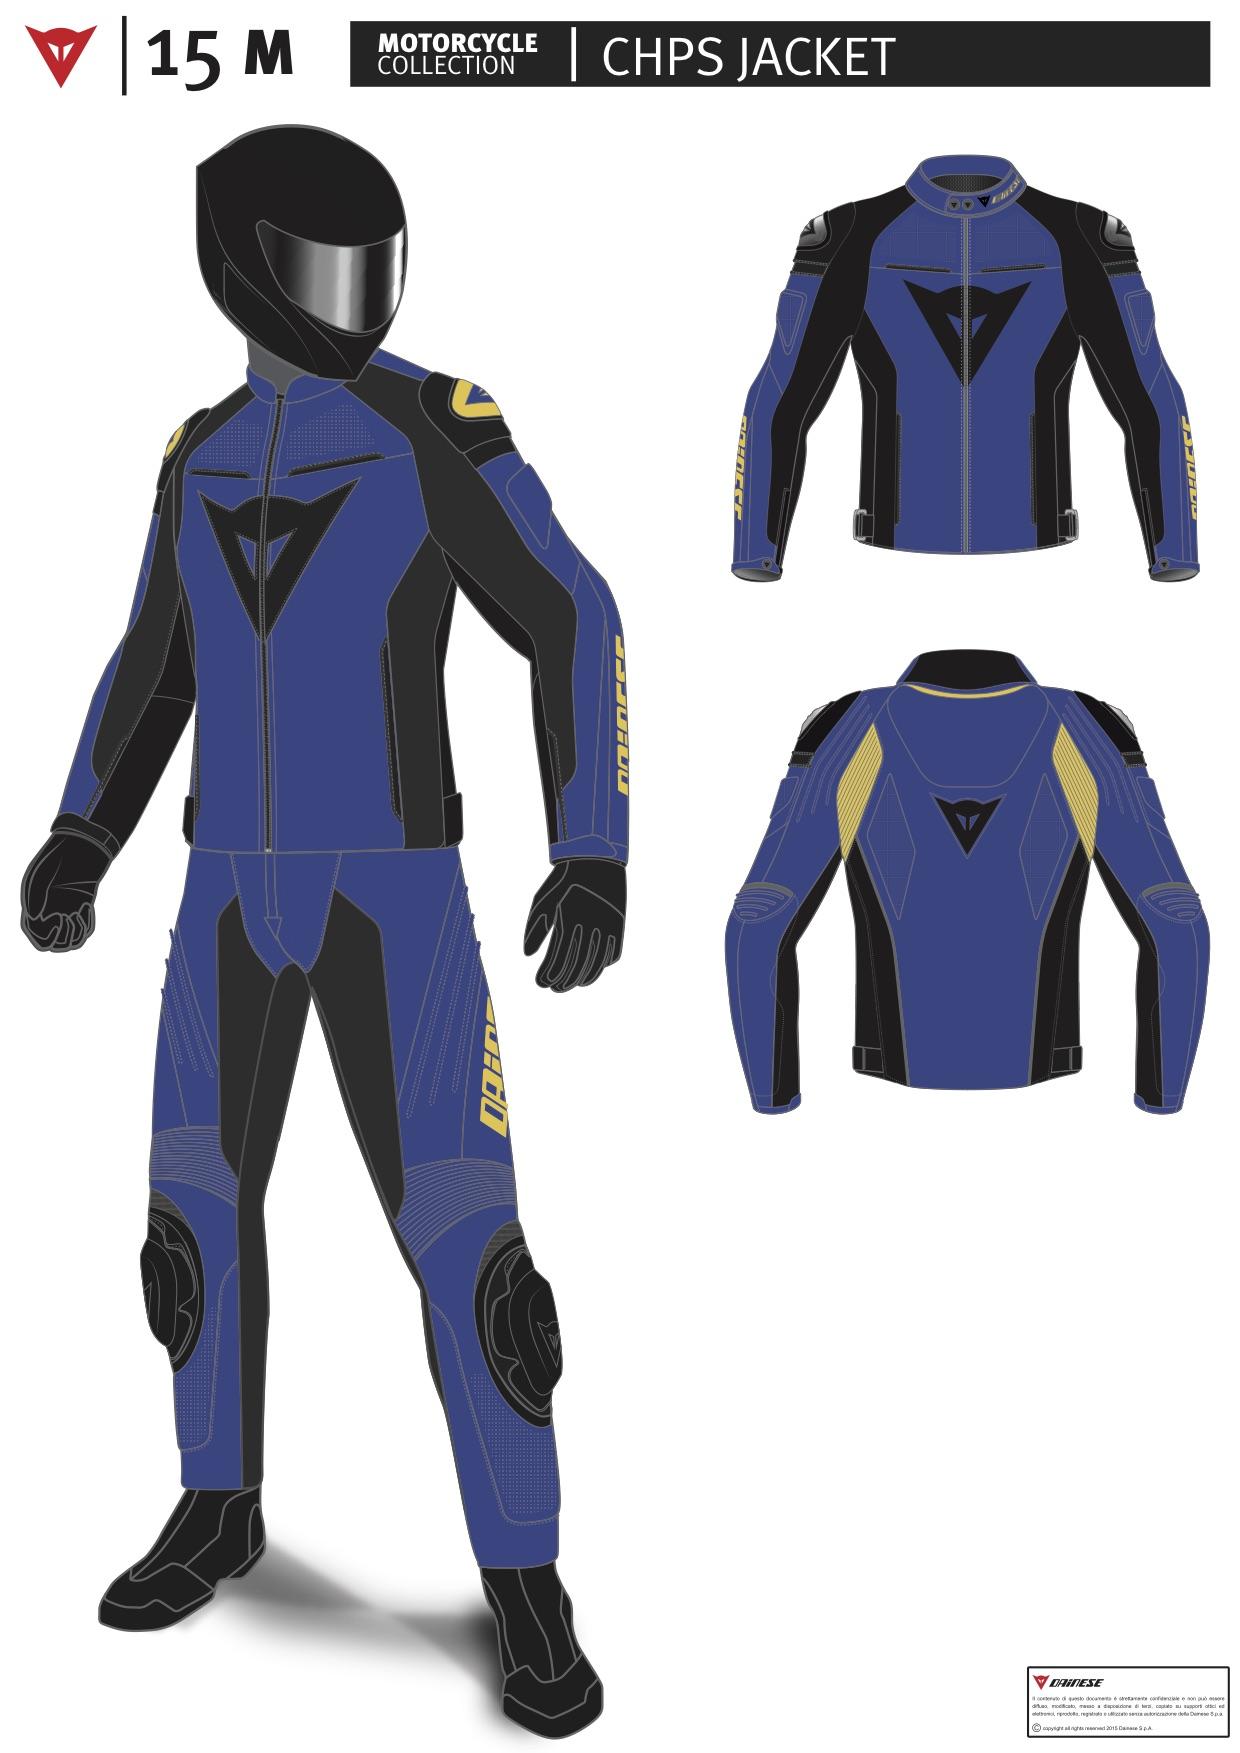 Designing with Ducati